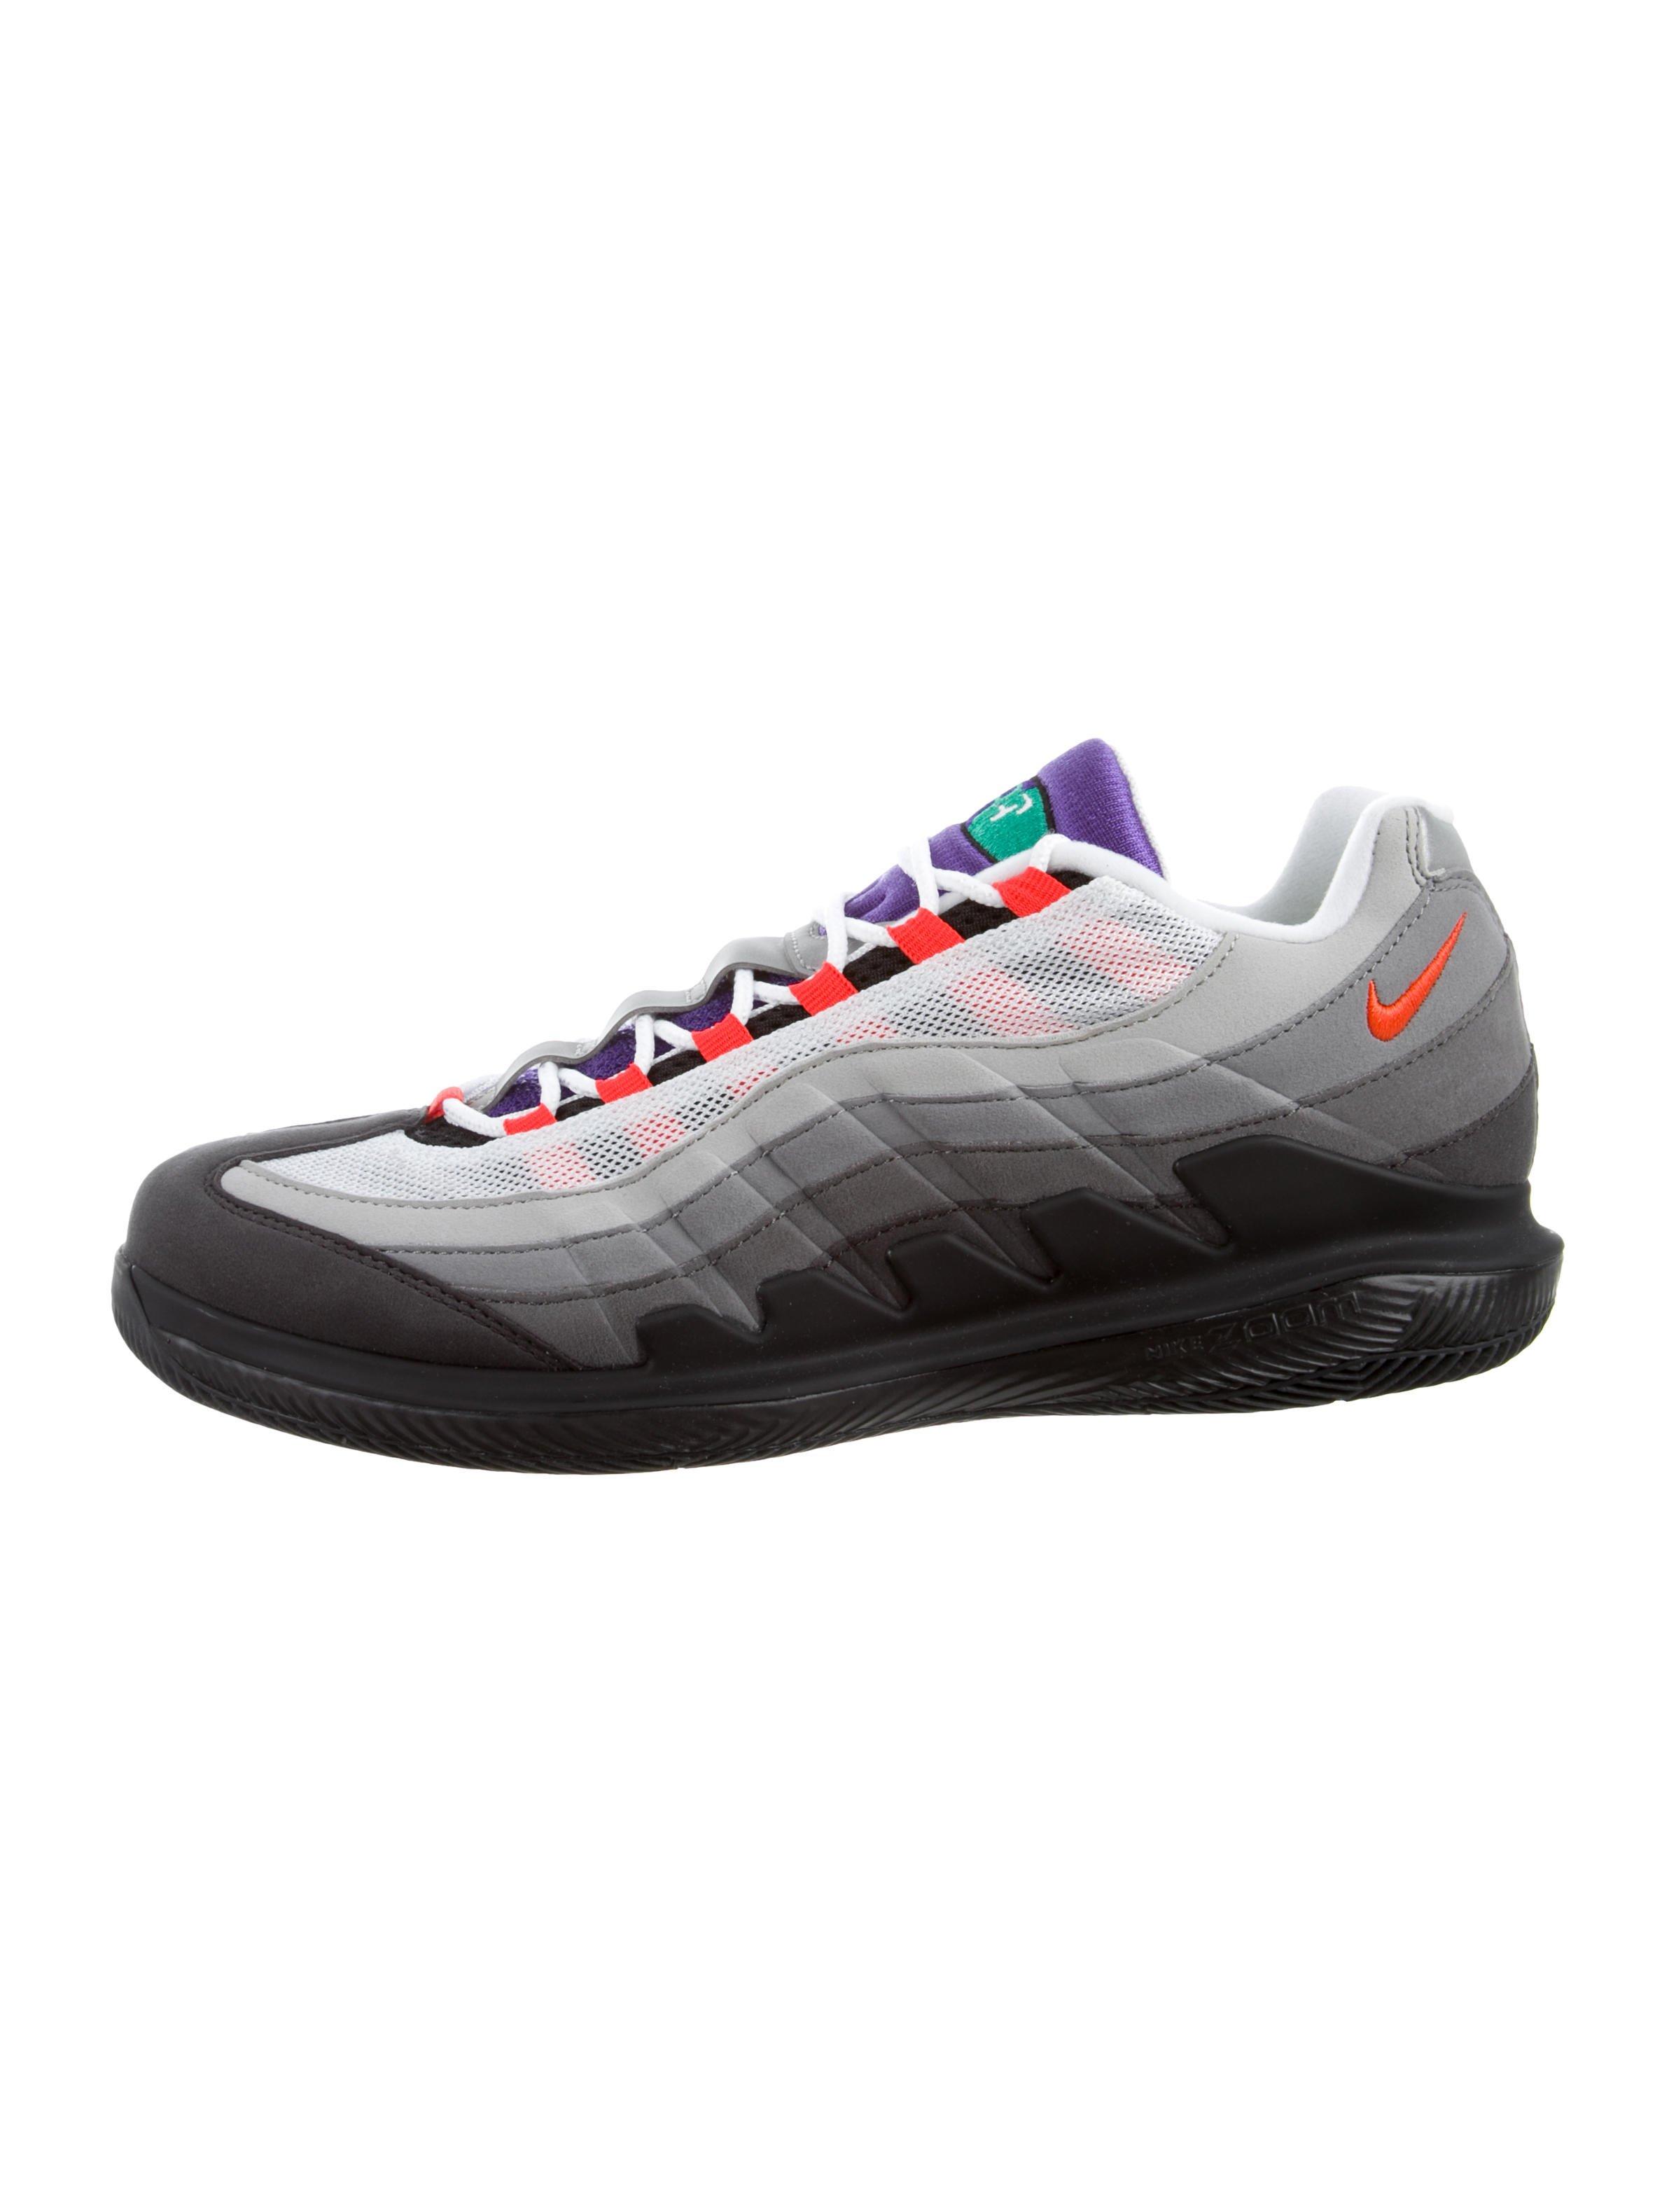 2394x3159 yeezy x adidas boost black white sneakers adidas yeezy